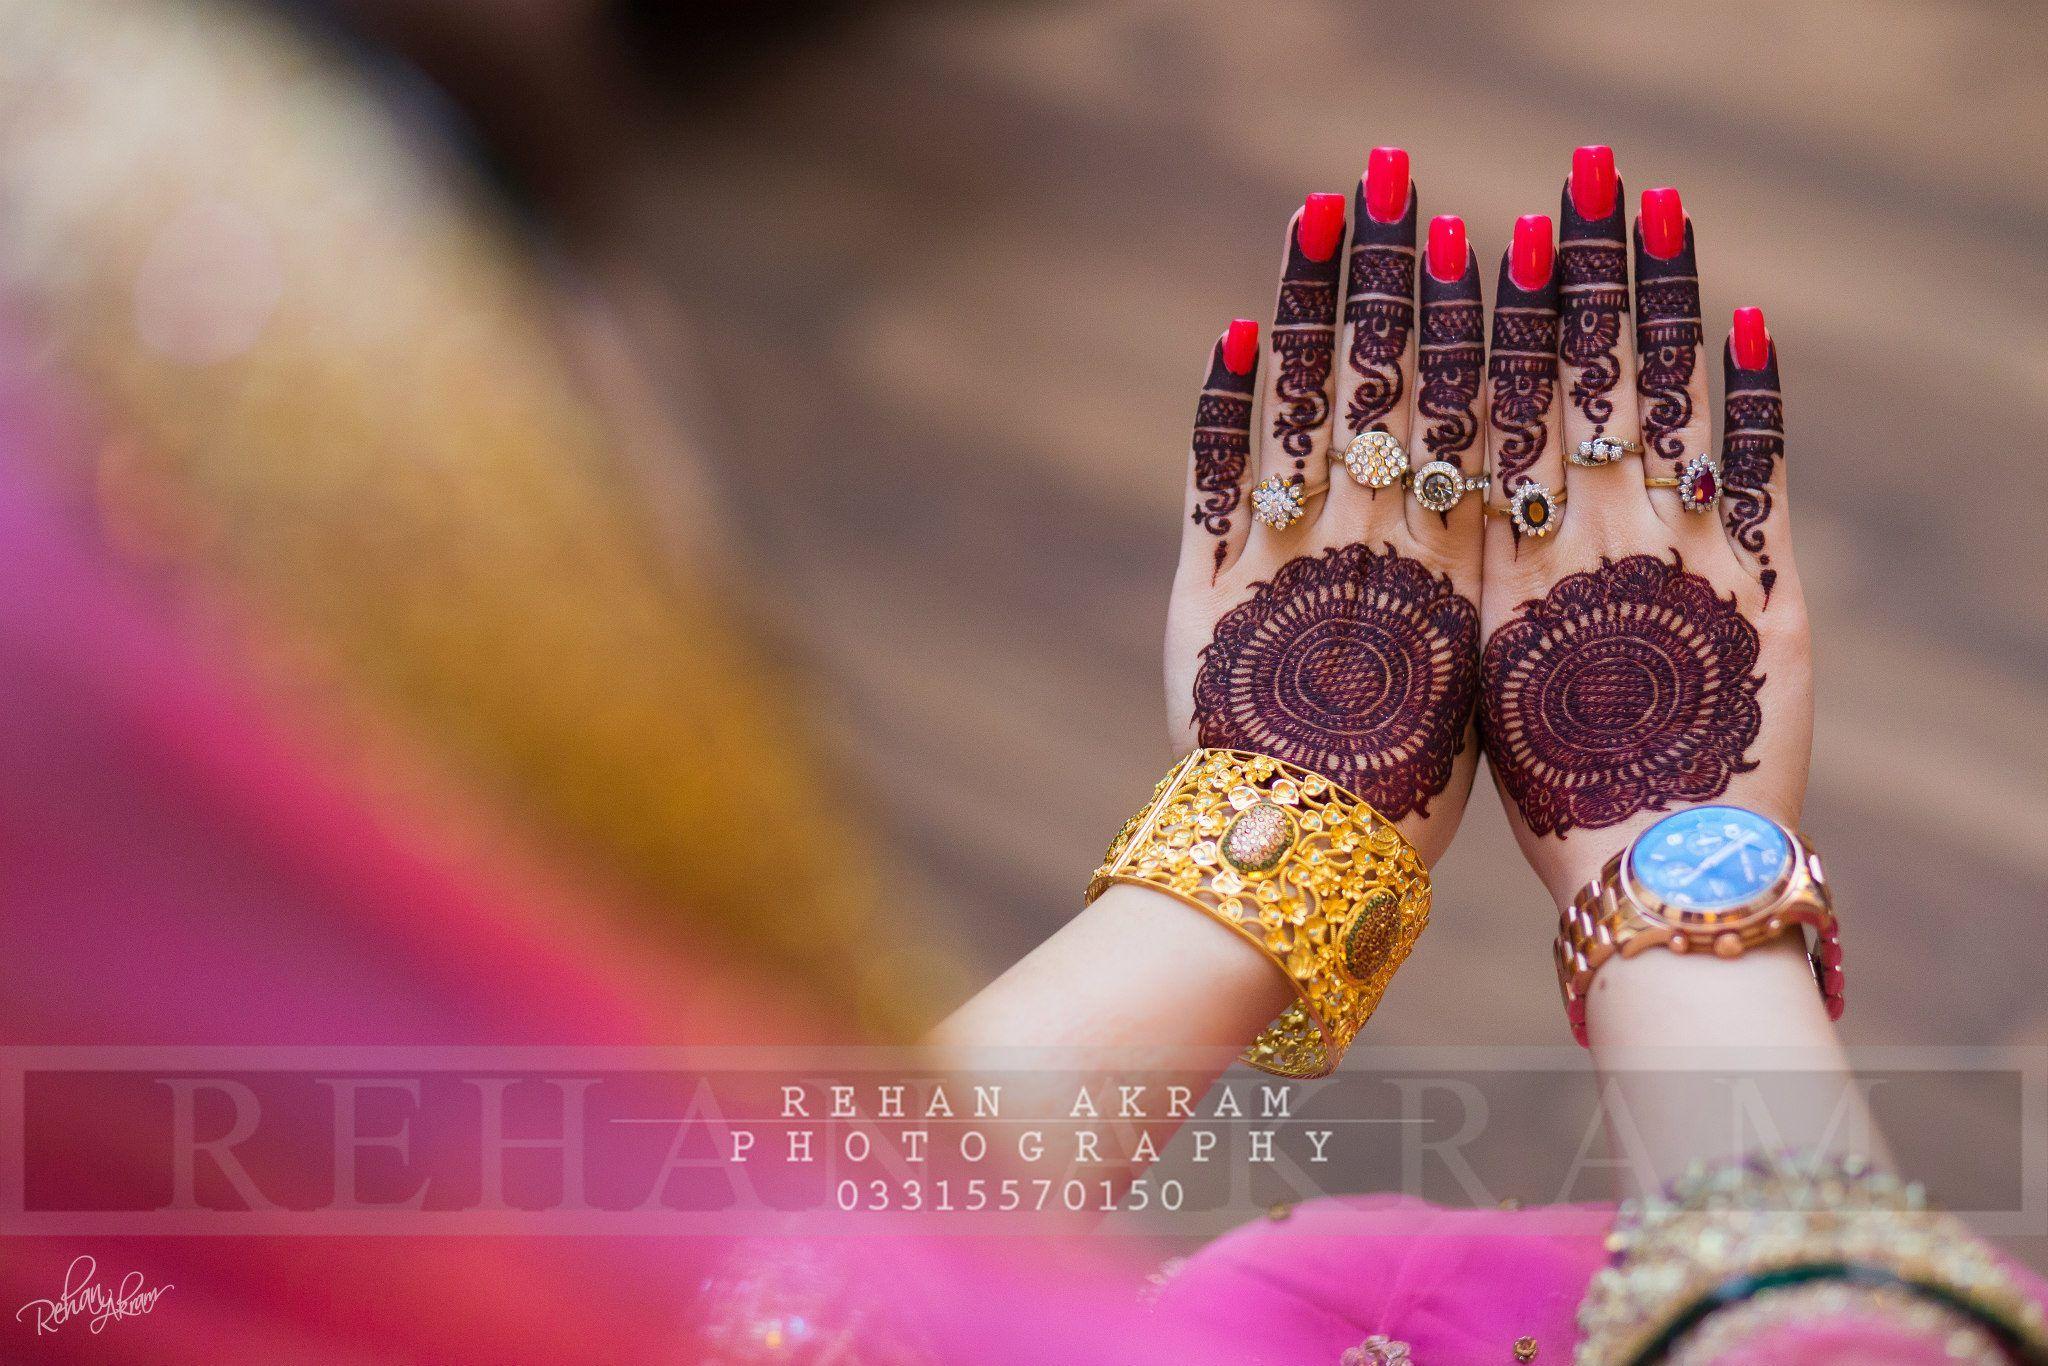 Rehan akram photography Beautiful Bridal hands